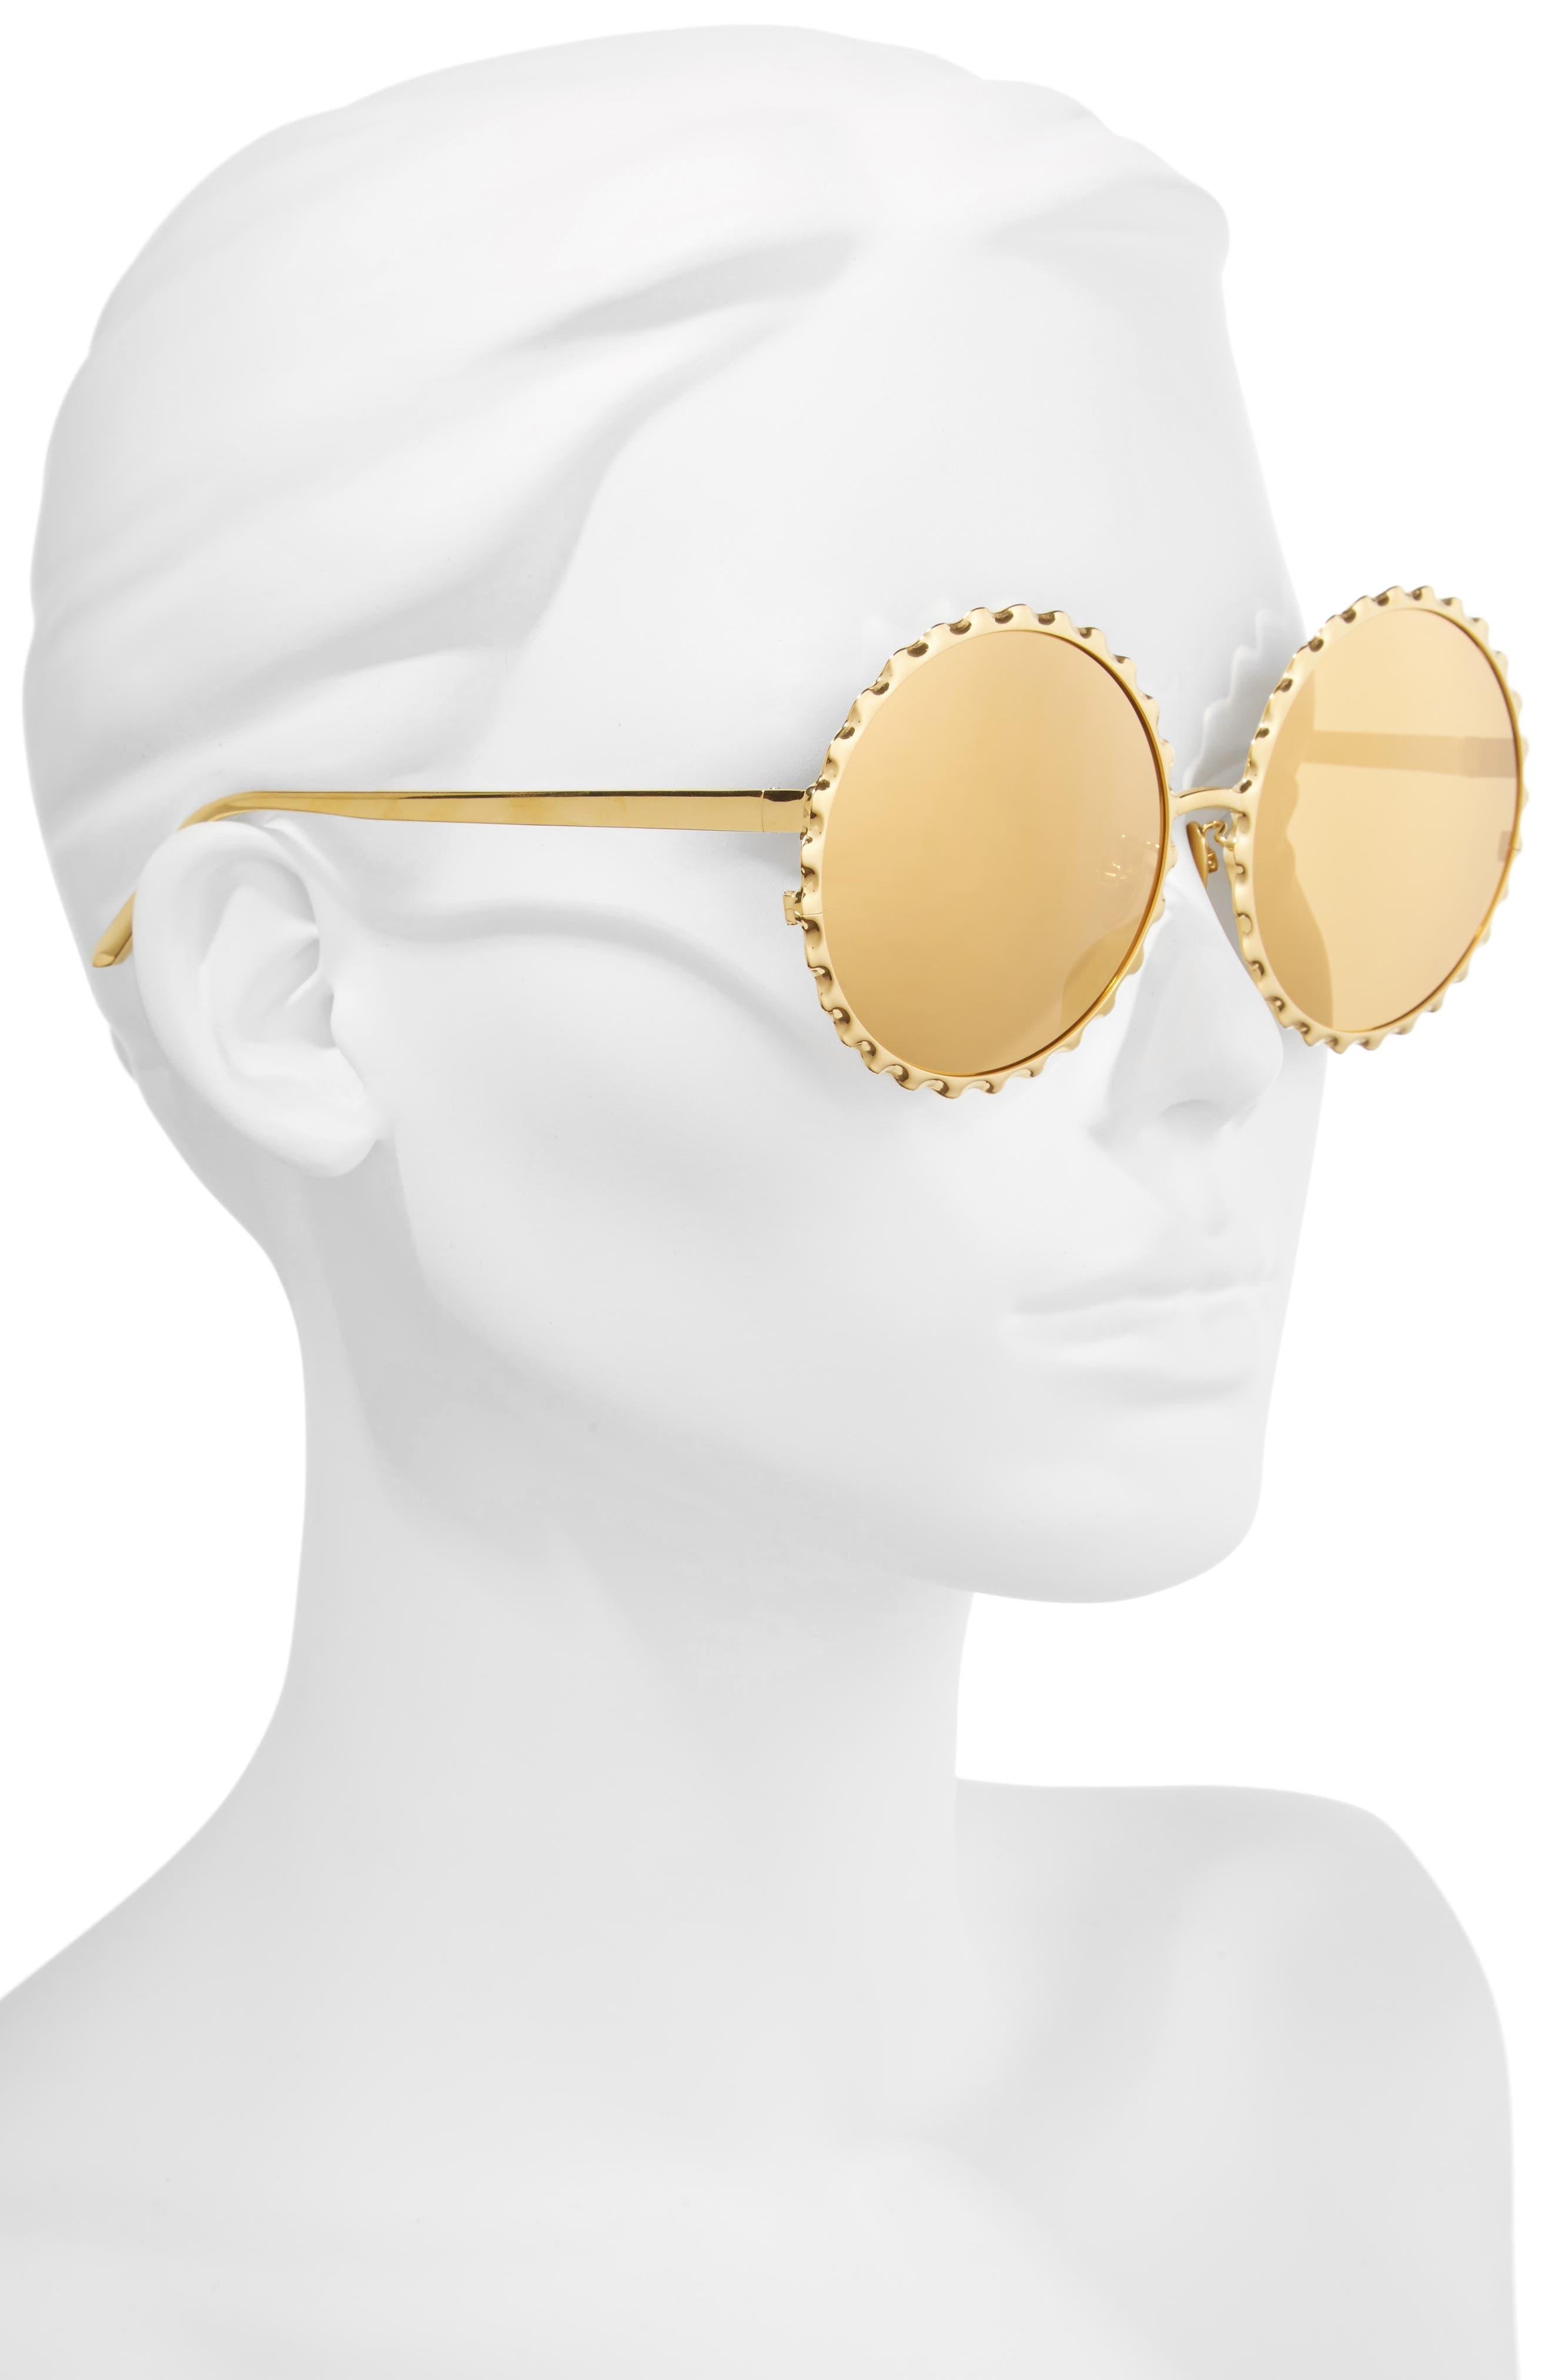 59mm Mirrored 18 Karat Gold Trim Round Sunglasses,                             Alternate thumbnail 2, color,                             Yellow Gold/ Gold